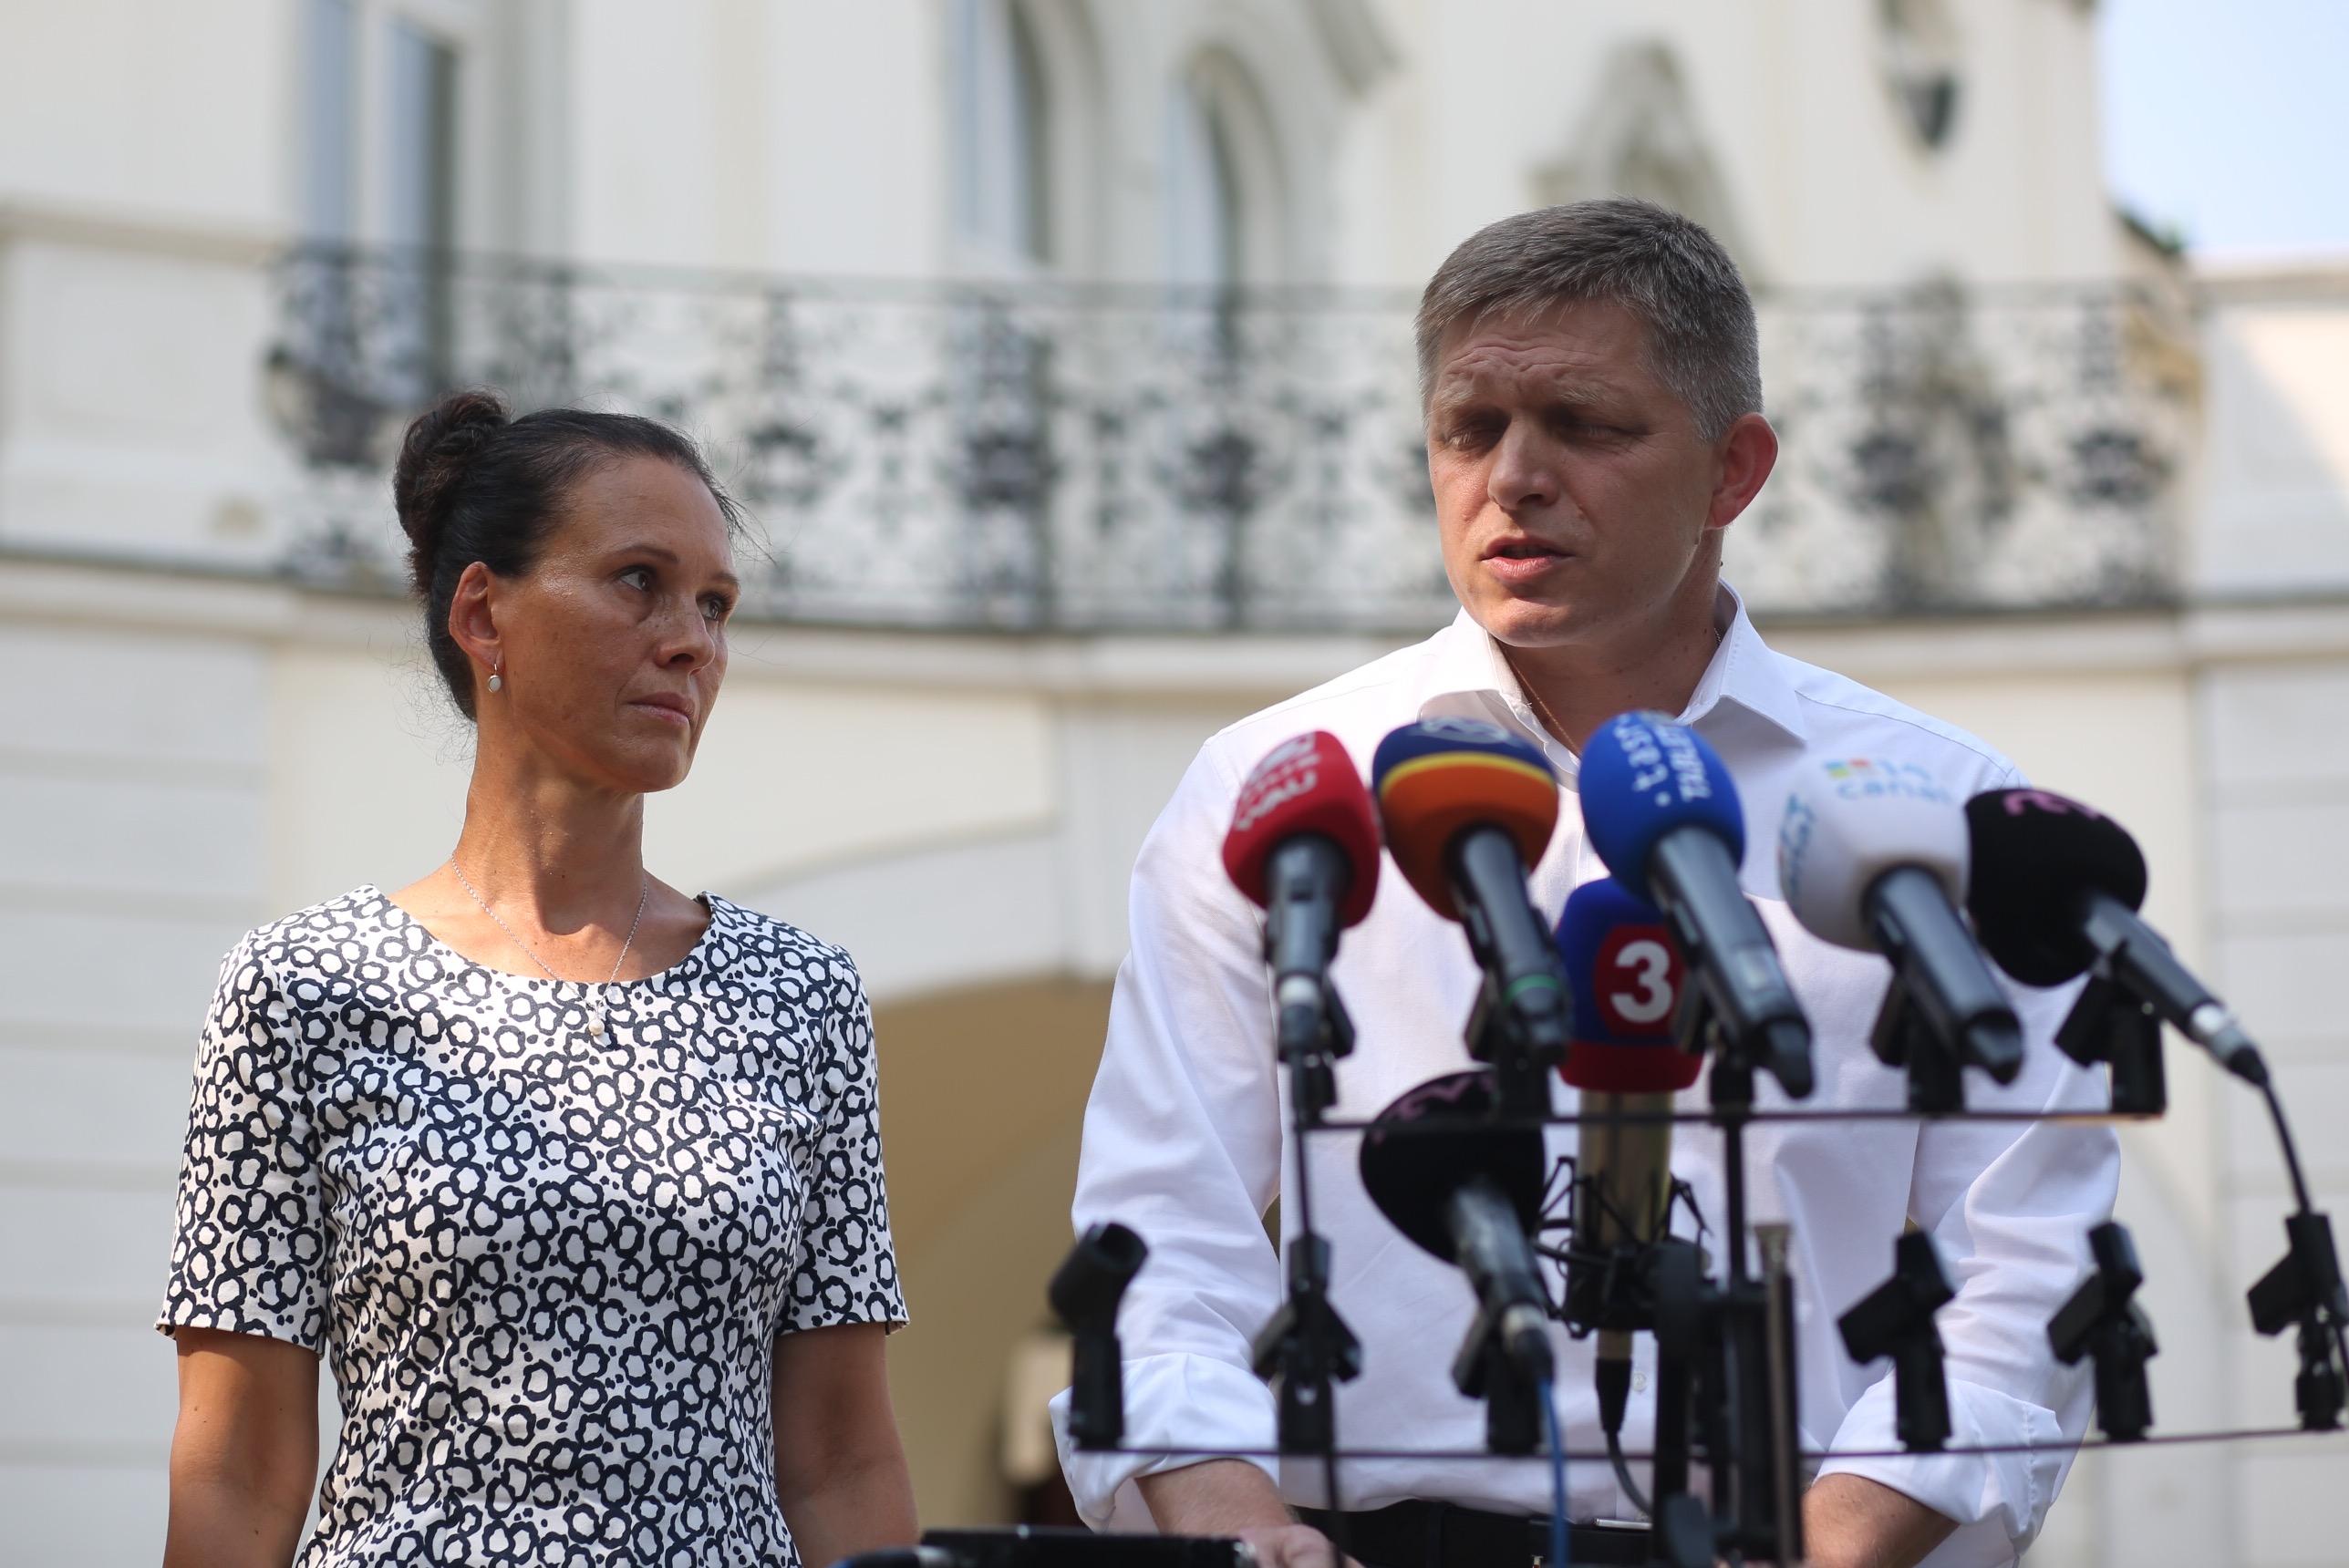 Matovič sľubuje dôkazy o účtoch Fica v Belize, premiér podal trestné oznámenie – Denník N